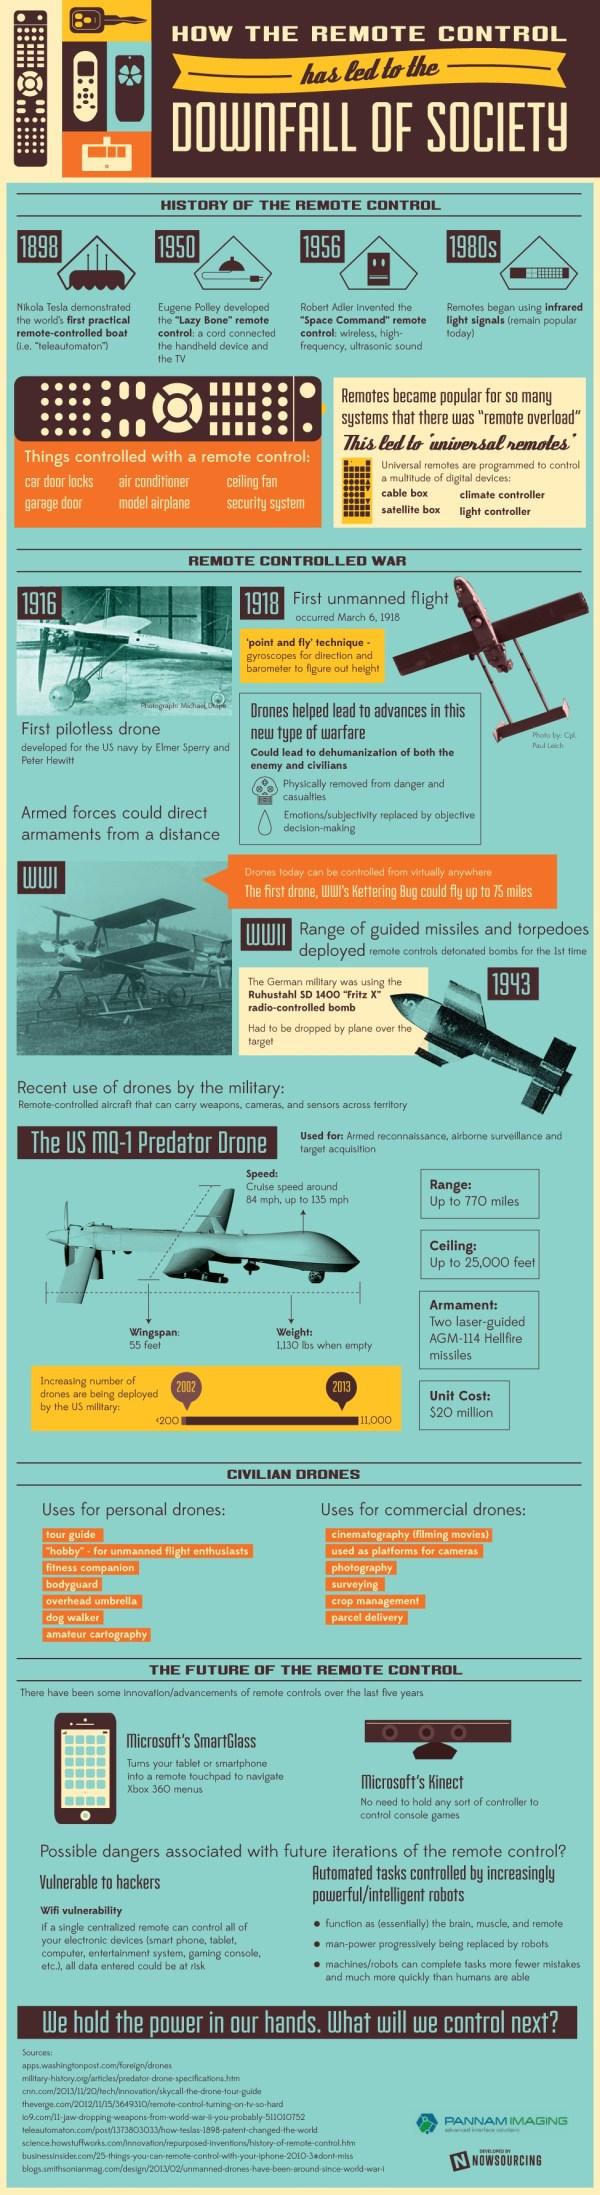 remote-control-infographic